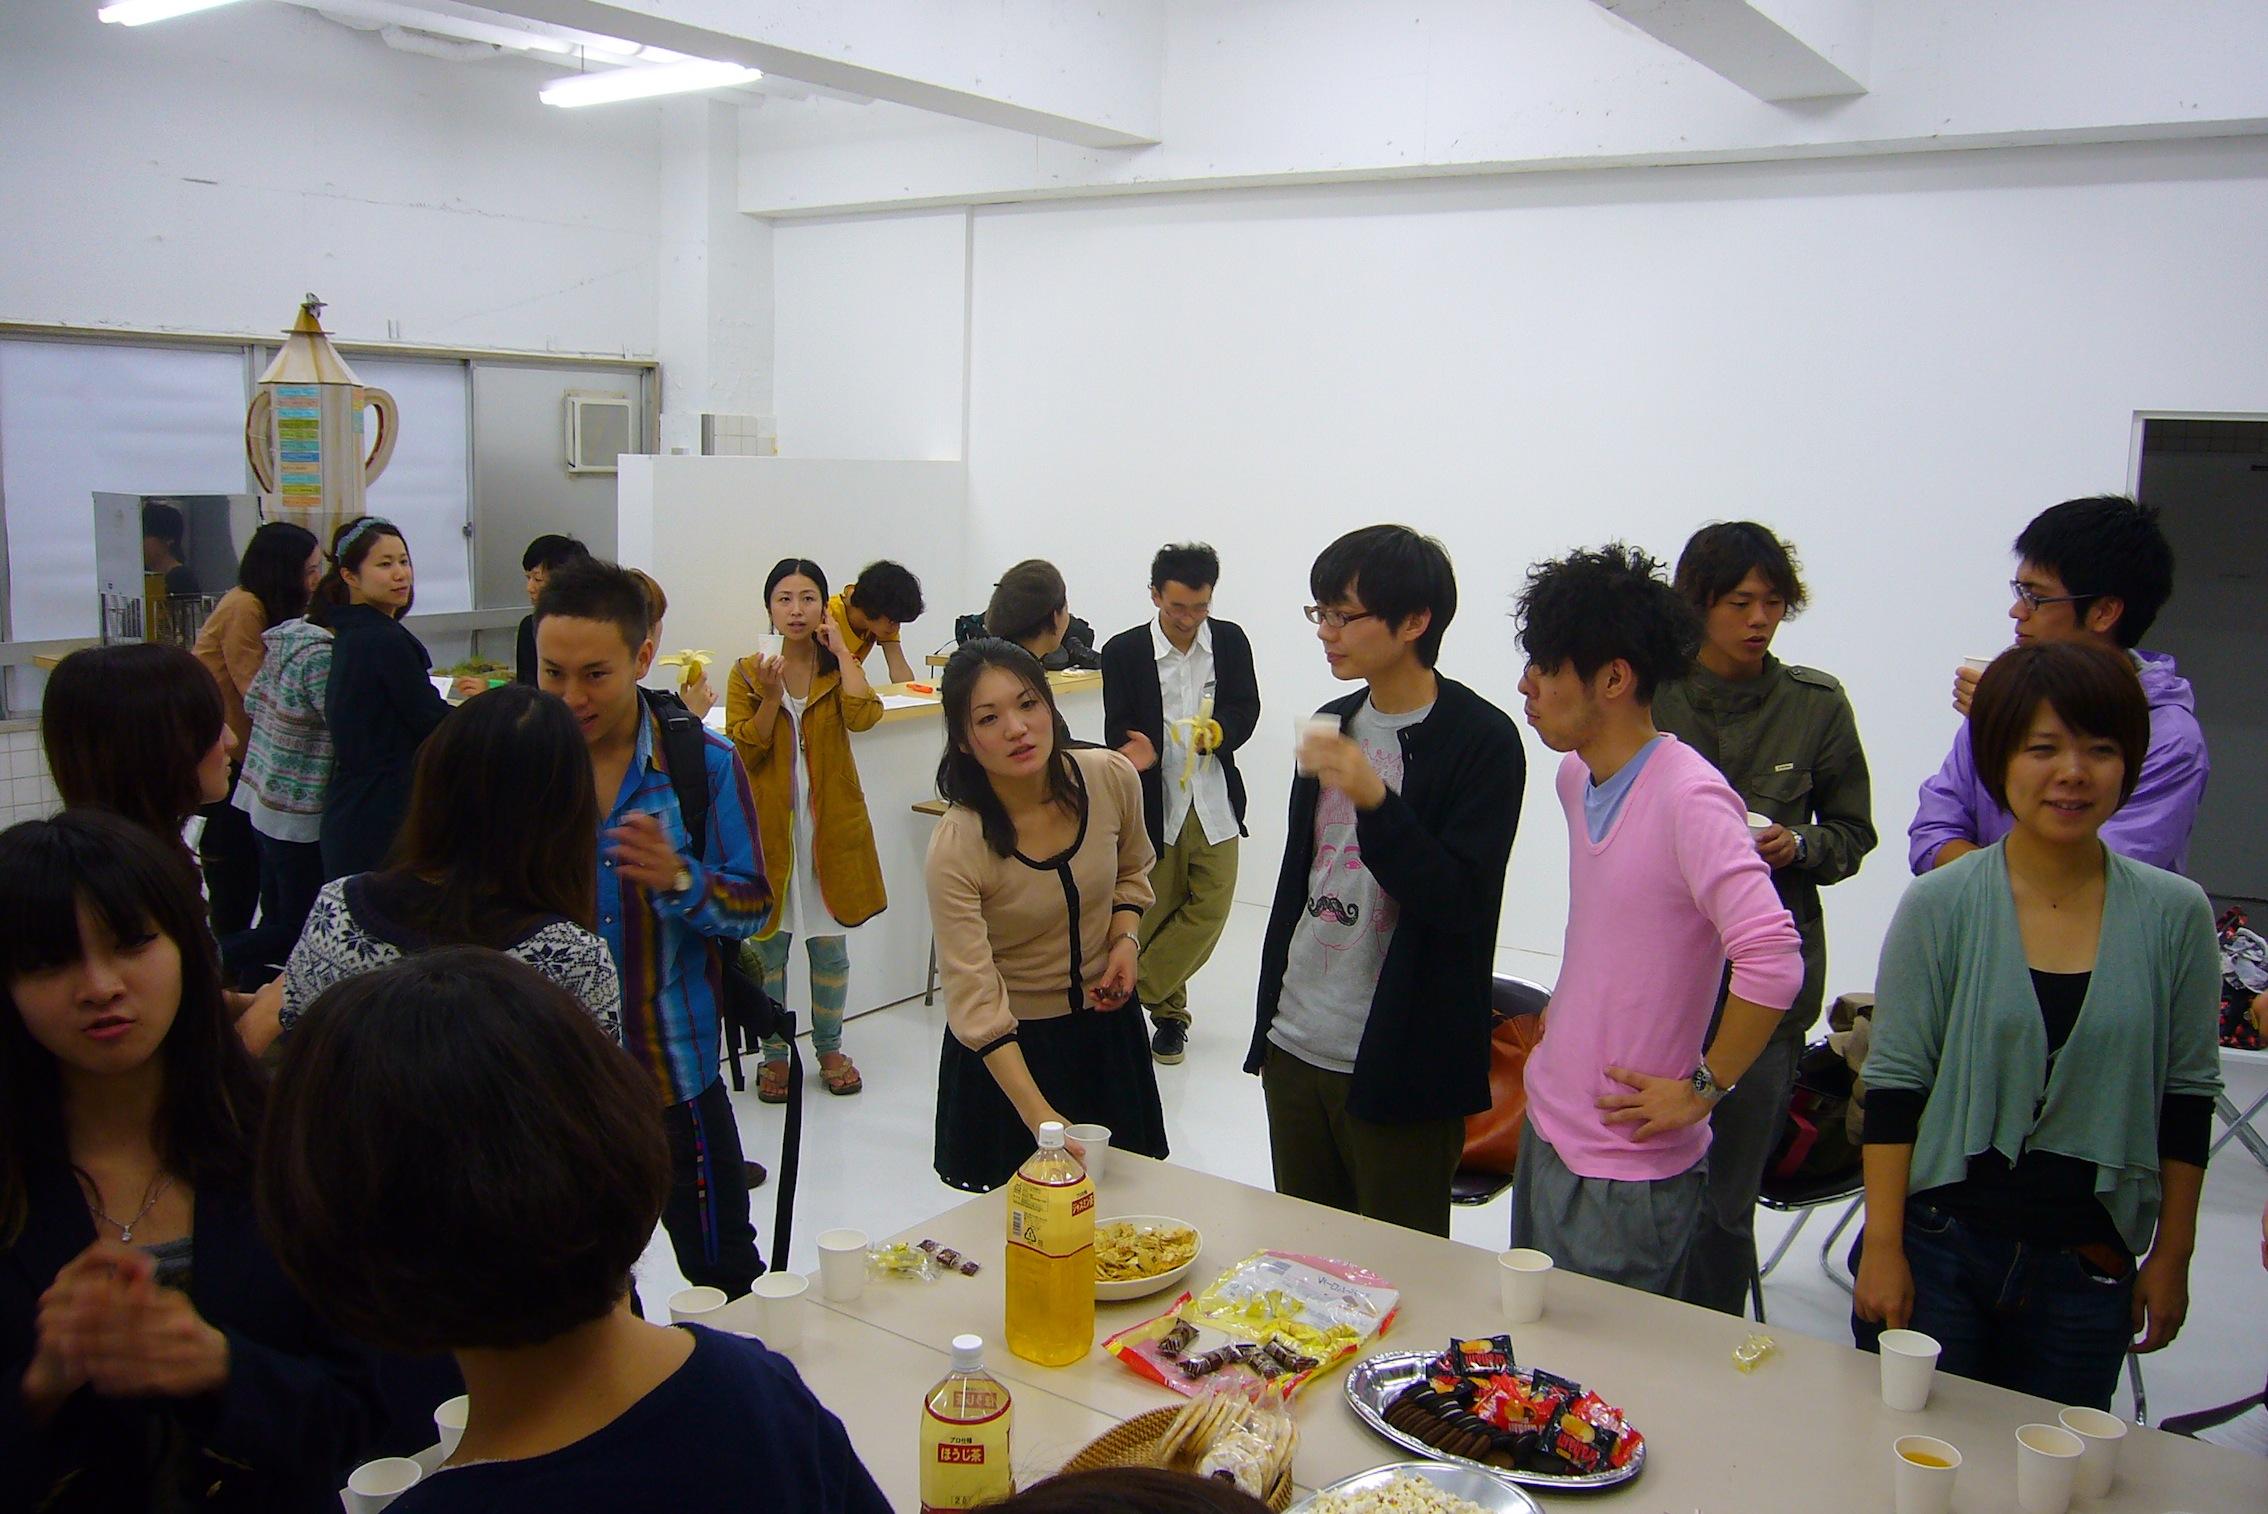 http://blog.3331.jp/staff/file/P1030426.JPG